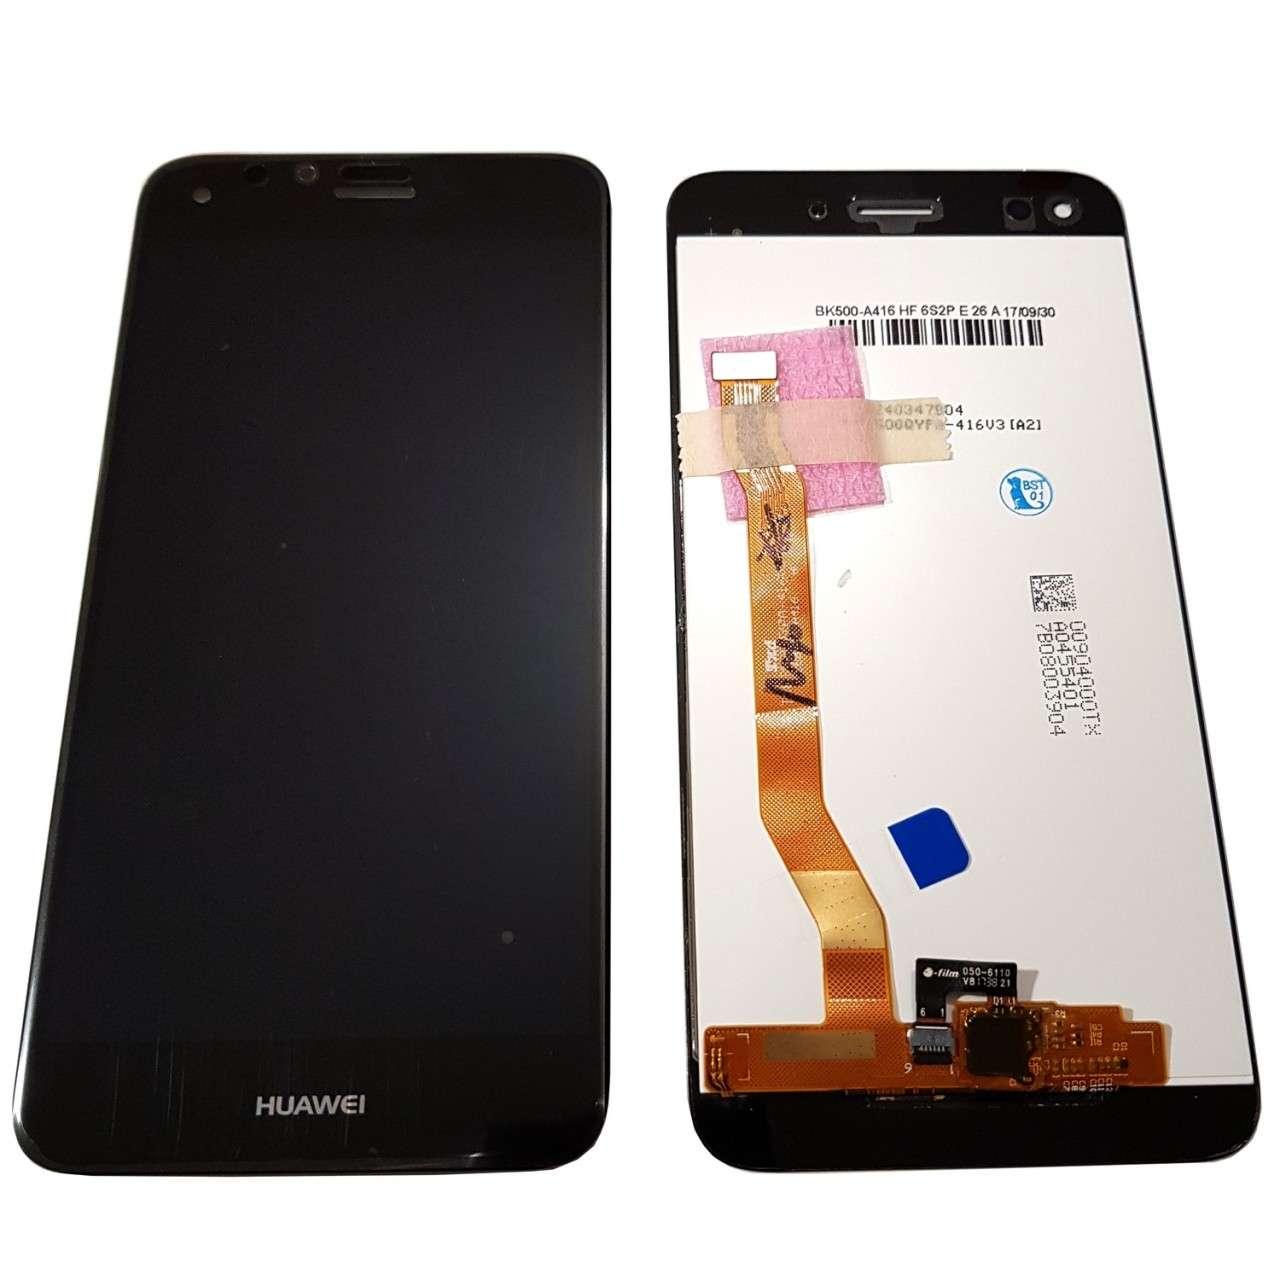 Display Huawei P9 Lite Mini 2017 Black Negru imagine powerlaptop.ro 2021